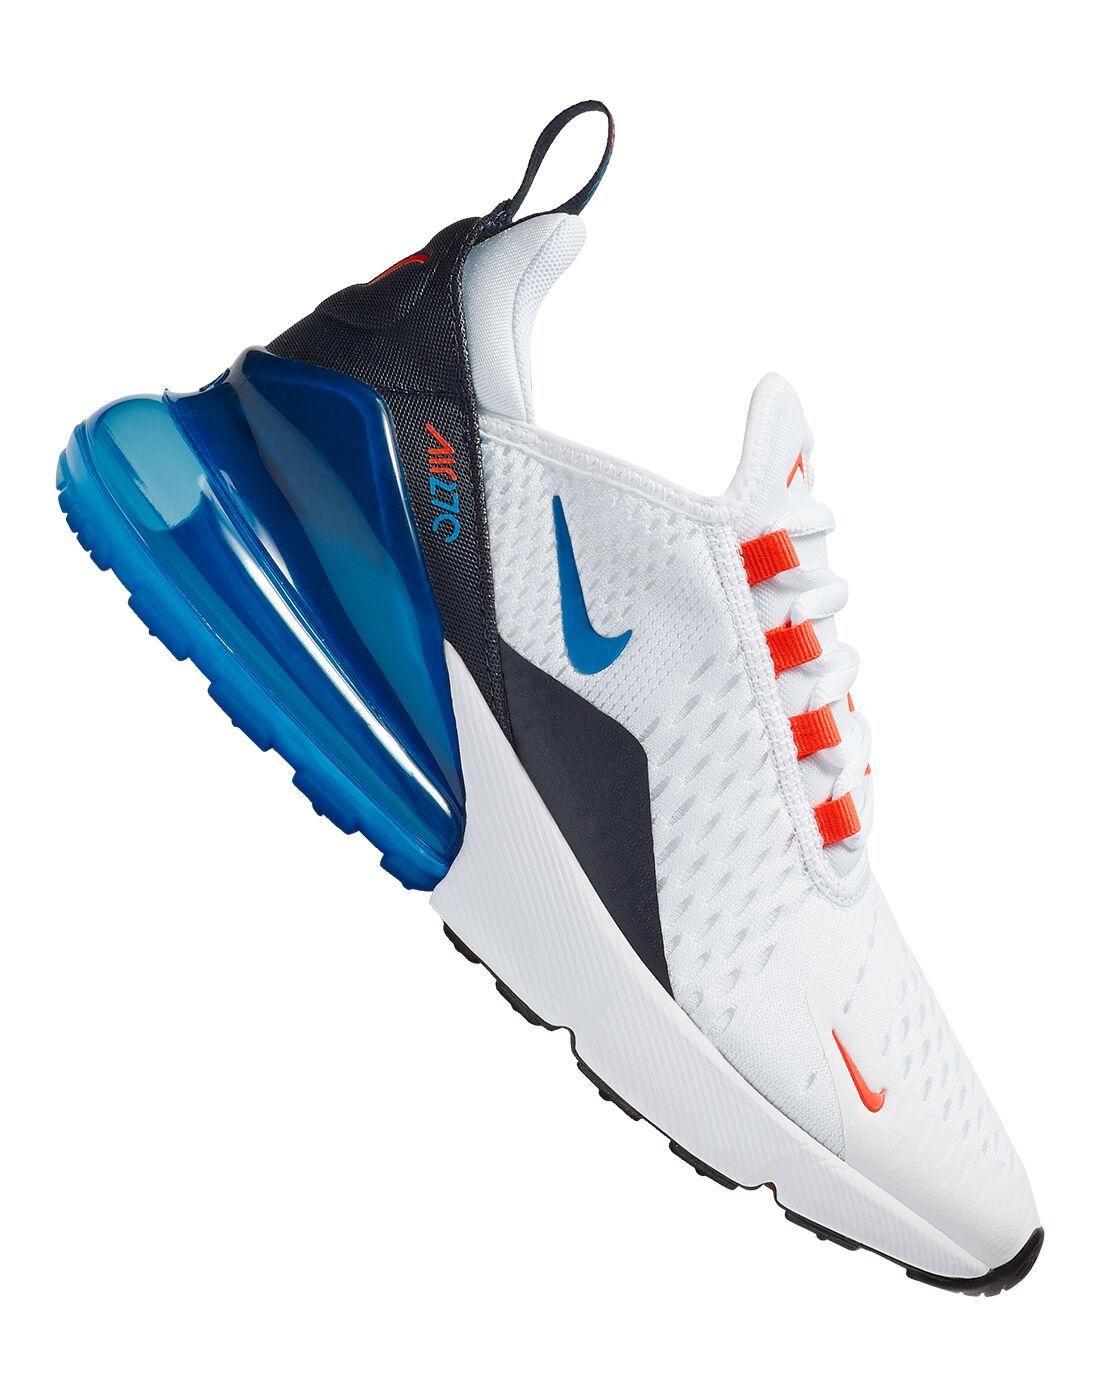 Kid's Blue Nike Air Max 270 | Life